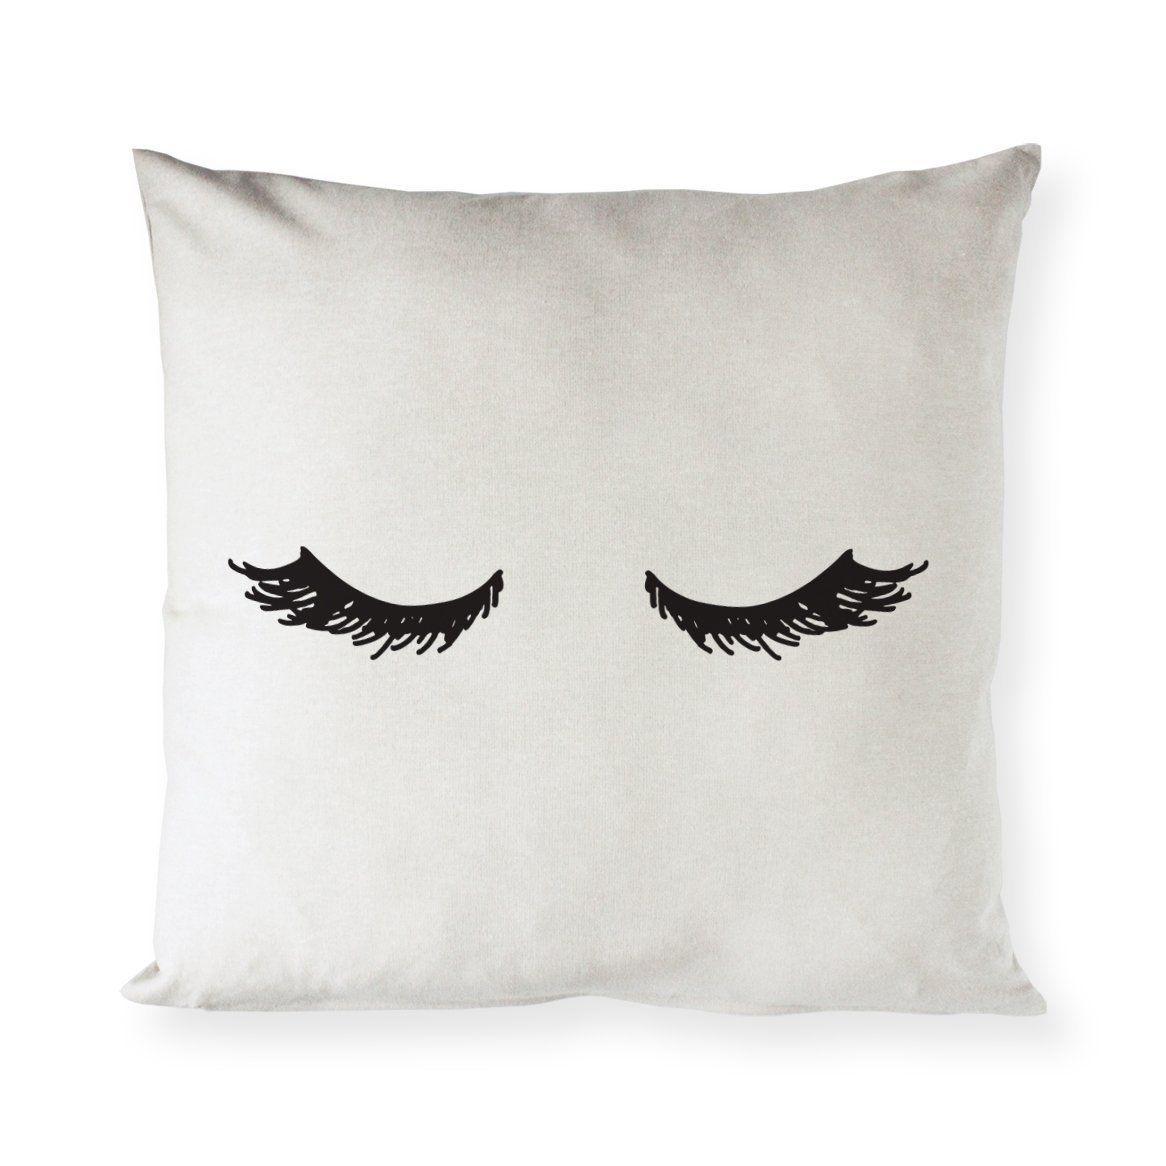 Sleeping Eyelashes Pillows Cute Pillows